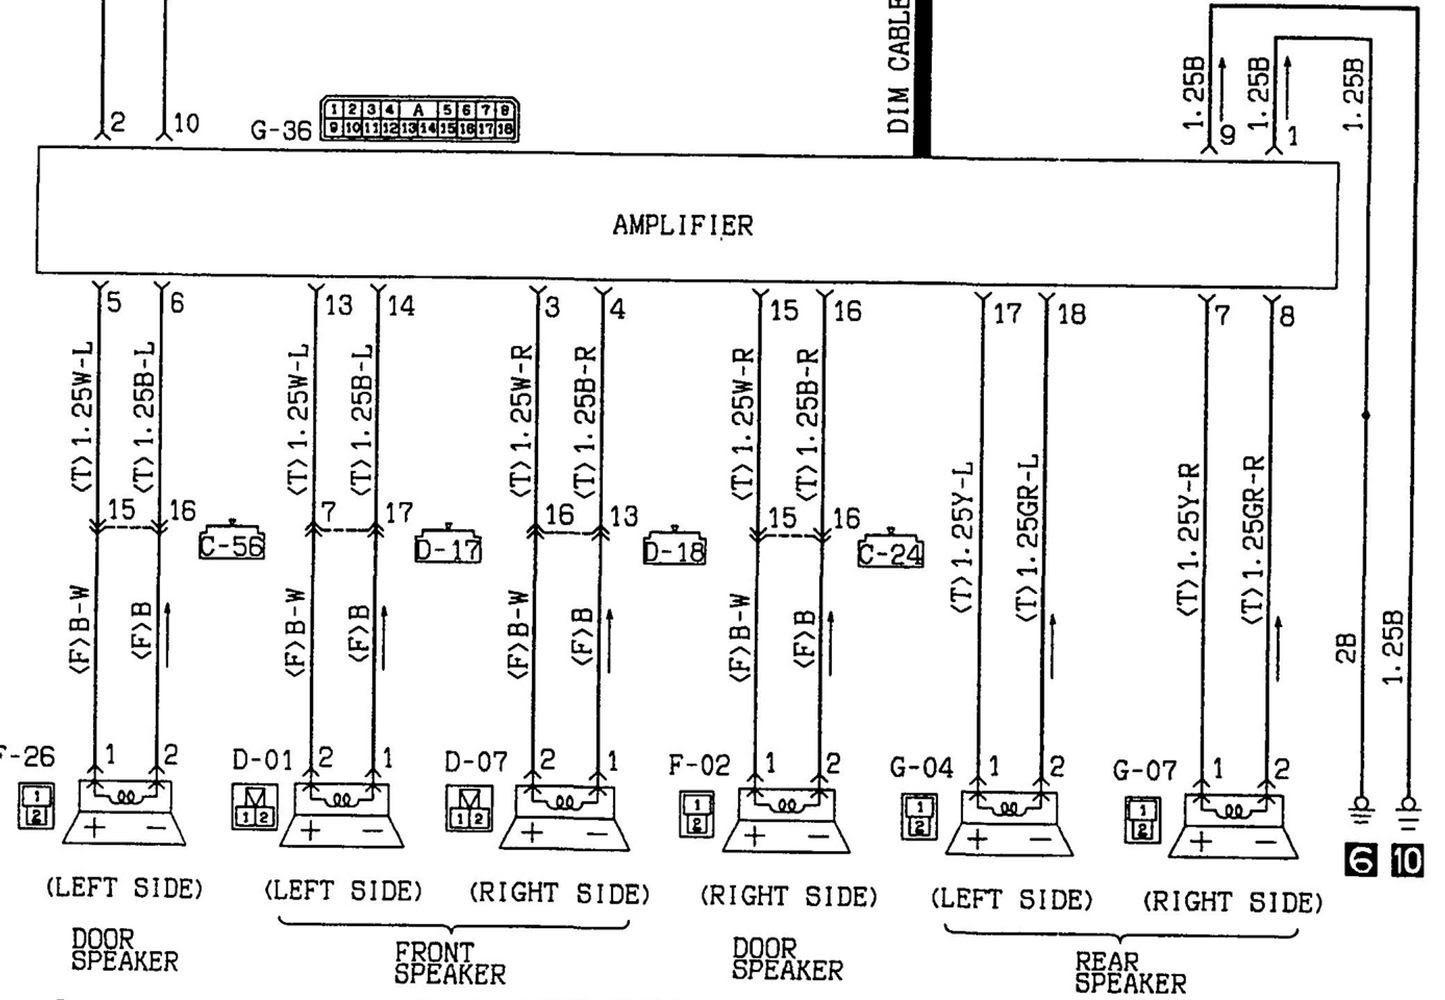 2002 Mitsubishi Eclipse Wiring Diagram Free Picture 2003 Mdx Fuse Diagram Fuses Boxs Losdol2 Jeanjaures37 Fr